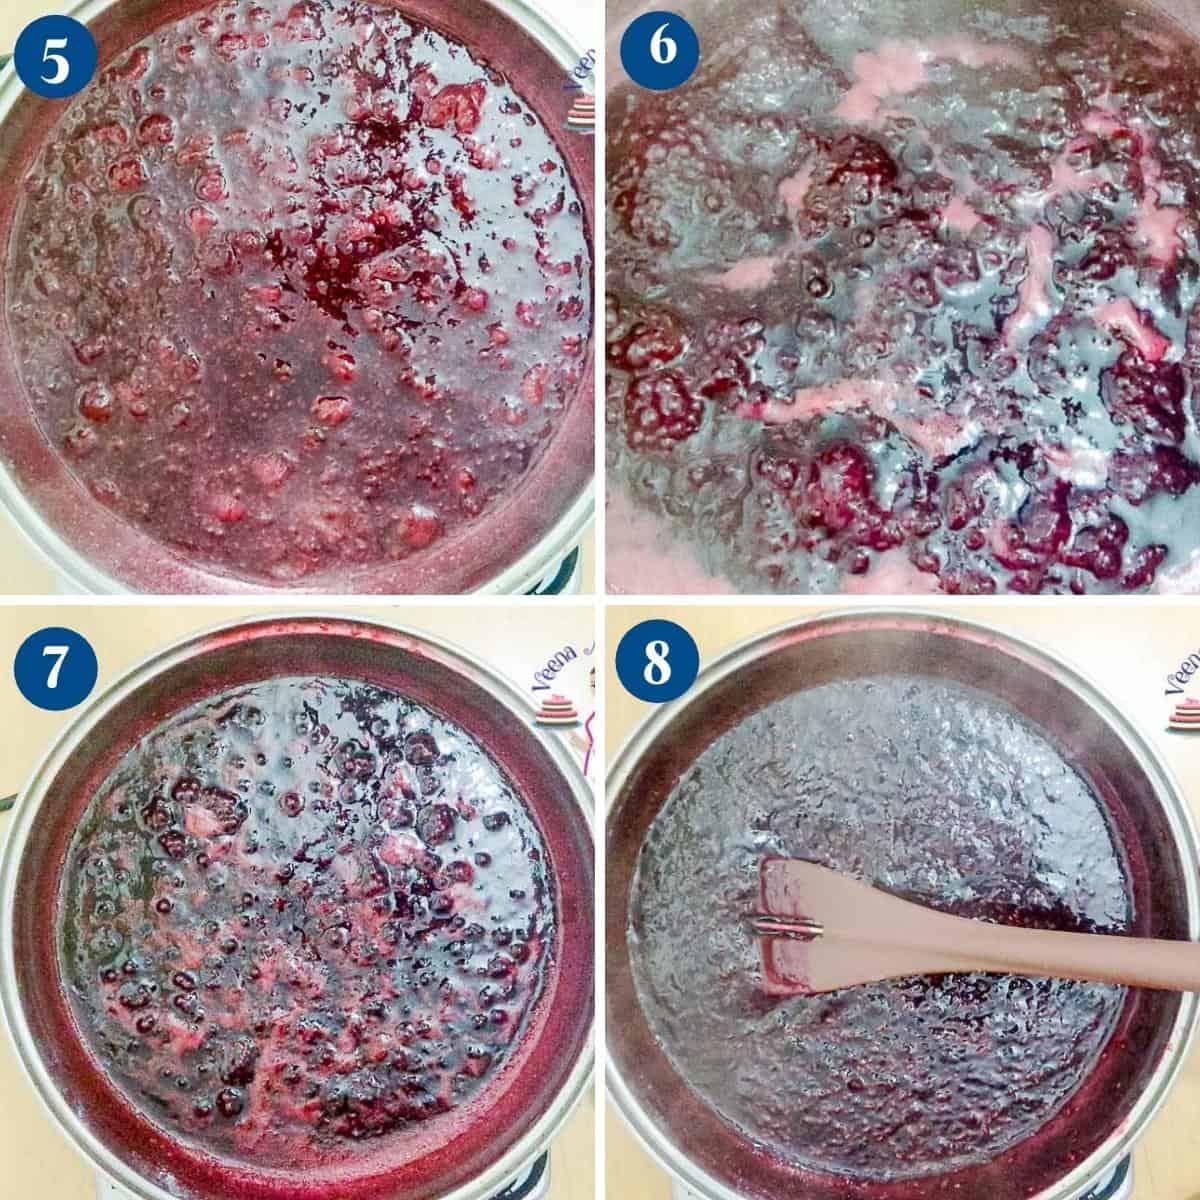 Progress pictures - jam with raspberries.